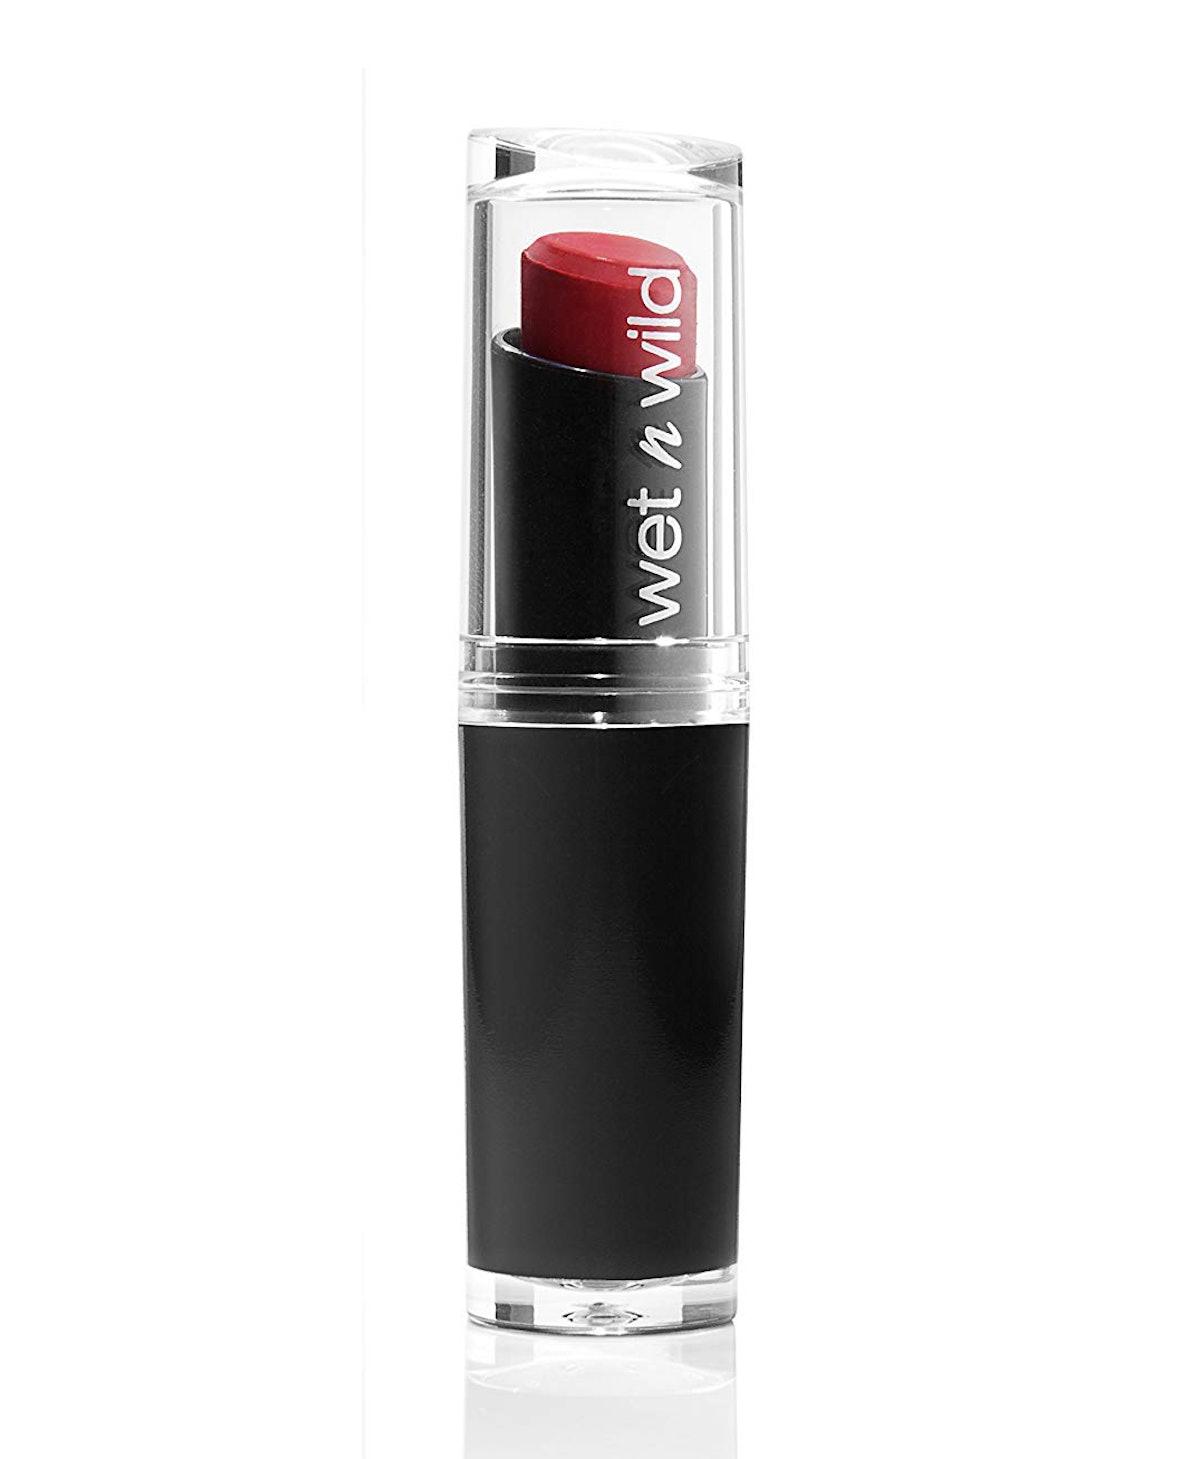 Wet n' Wild Megalast Lip Color, Stoplight Red